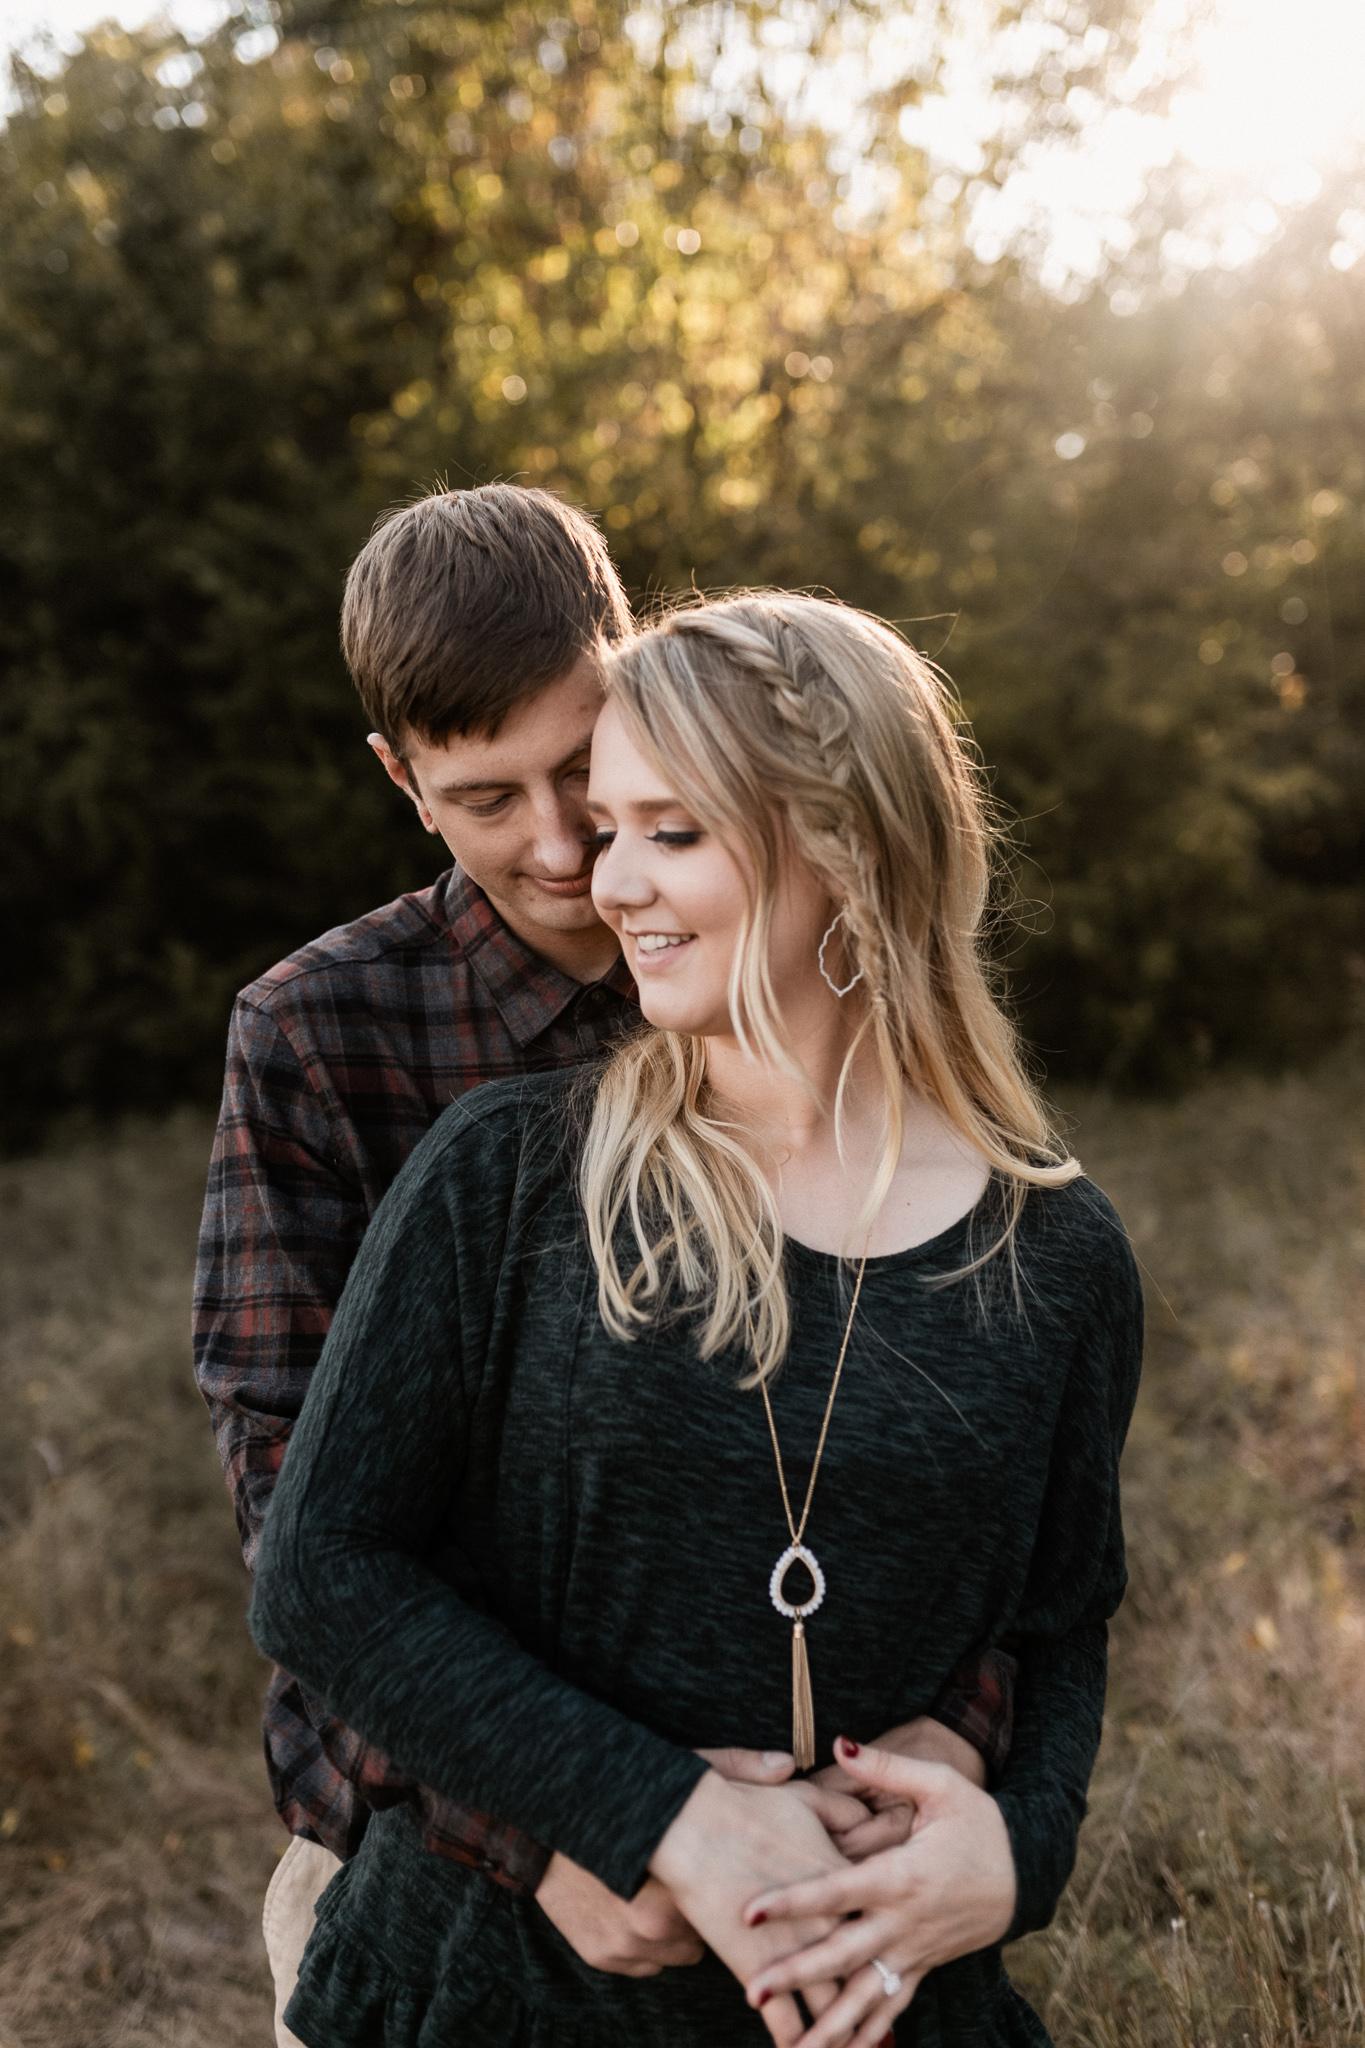 Kyle + Brittany | Fall Lake Engagement Photos | Oklahoma Lifestyle Photographer-3.jpg